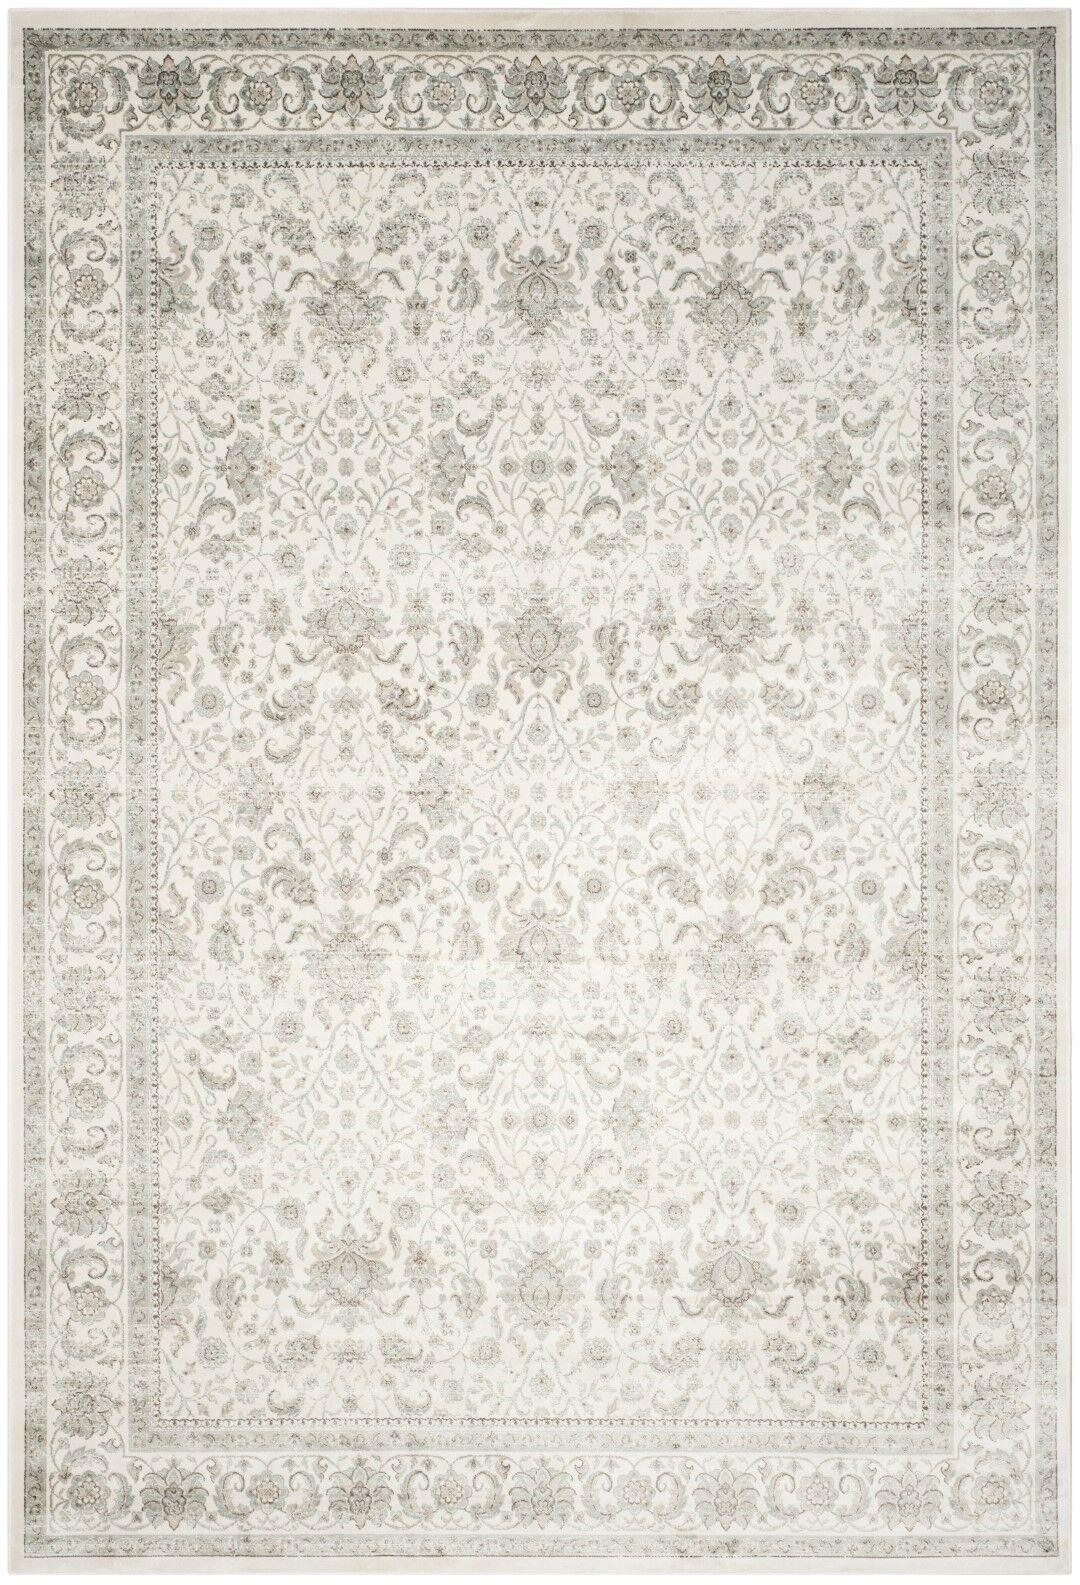 Setser Ivory/Silver Area Rug Rug Size: Rectangle 8' x 11'2